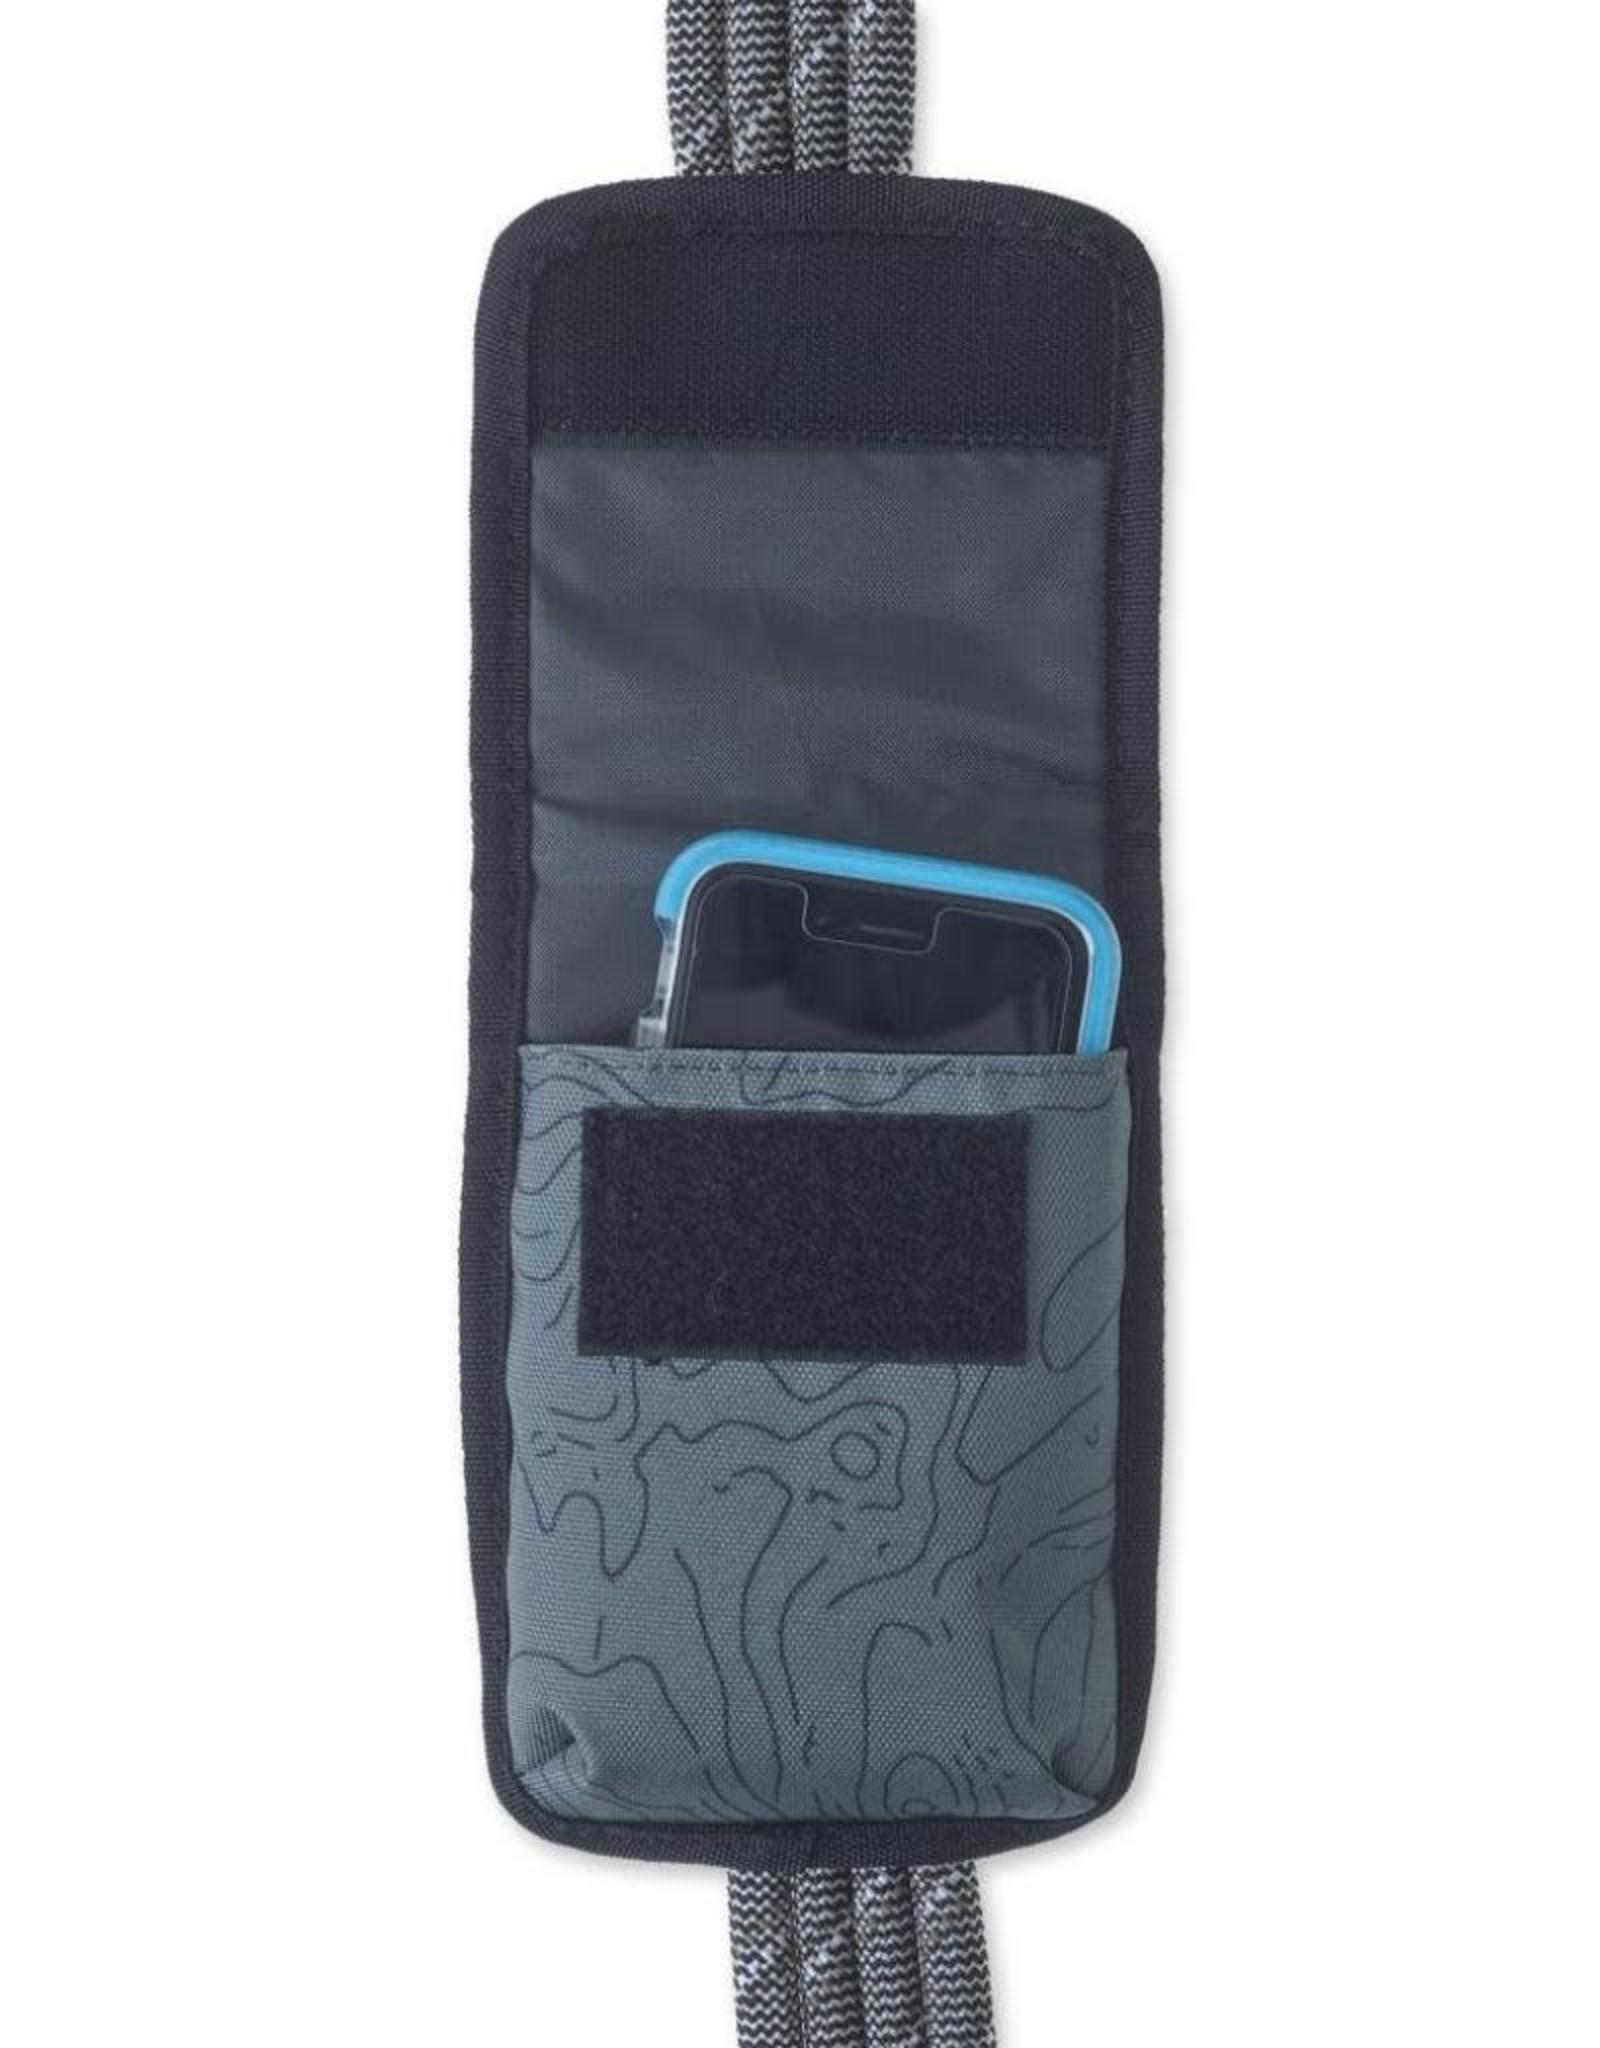 KAVU Phone Booth